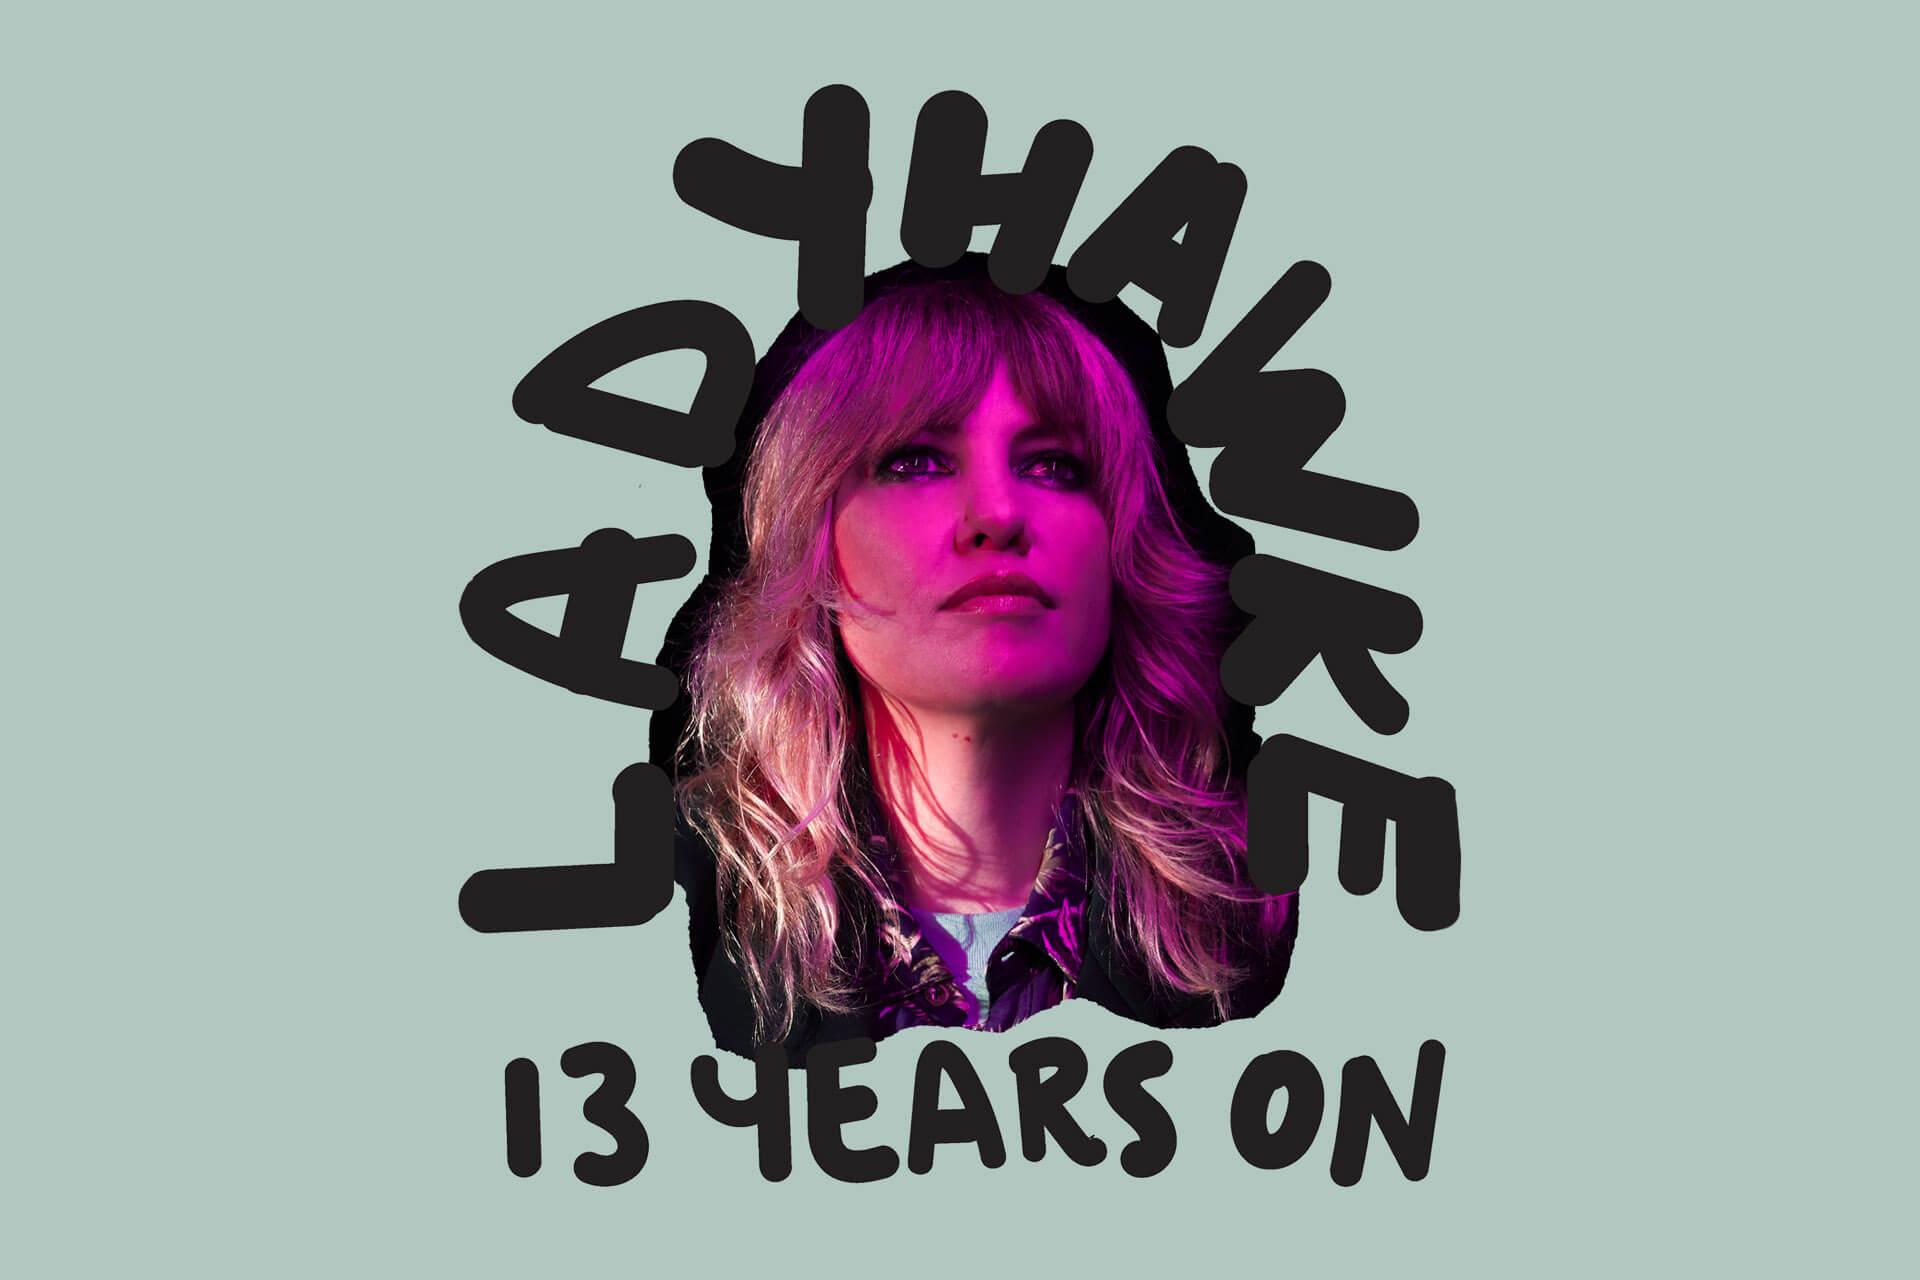 LADYHAWKE — 13 Years On